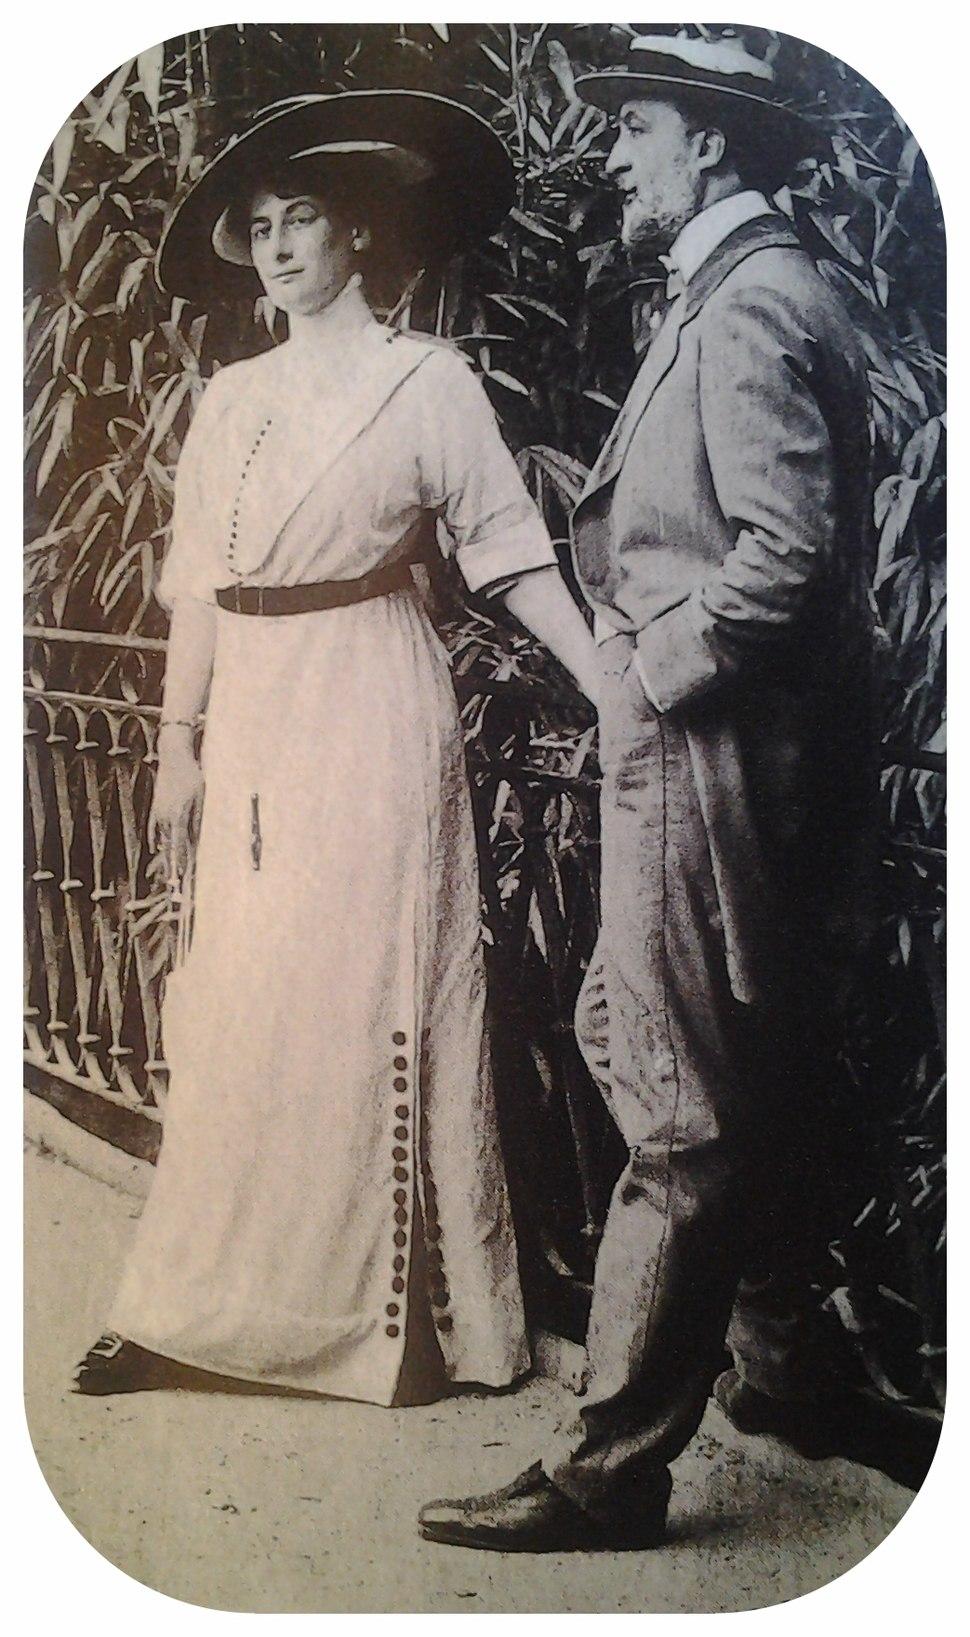 Adeline and Hector Guimard